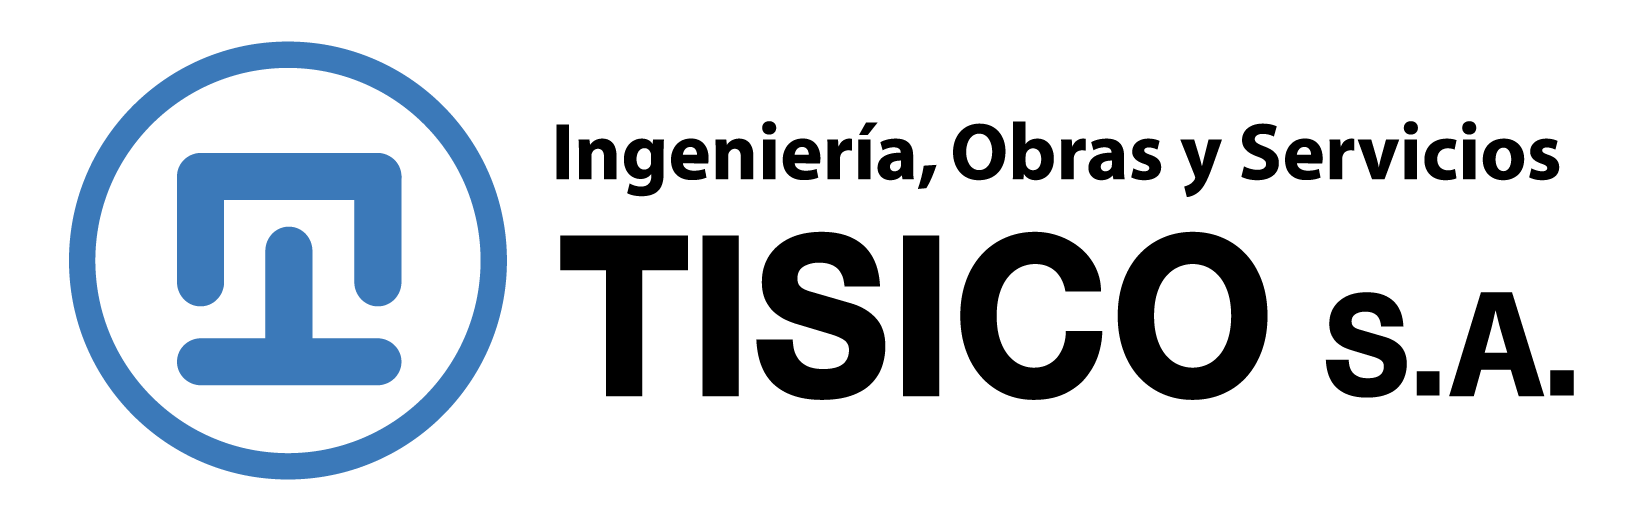 logo-con-fondo-transparente